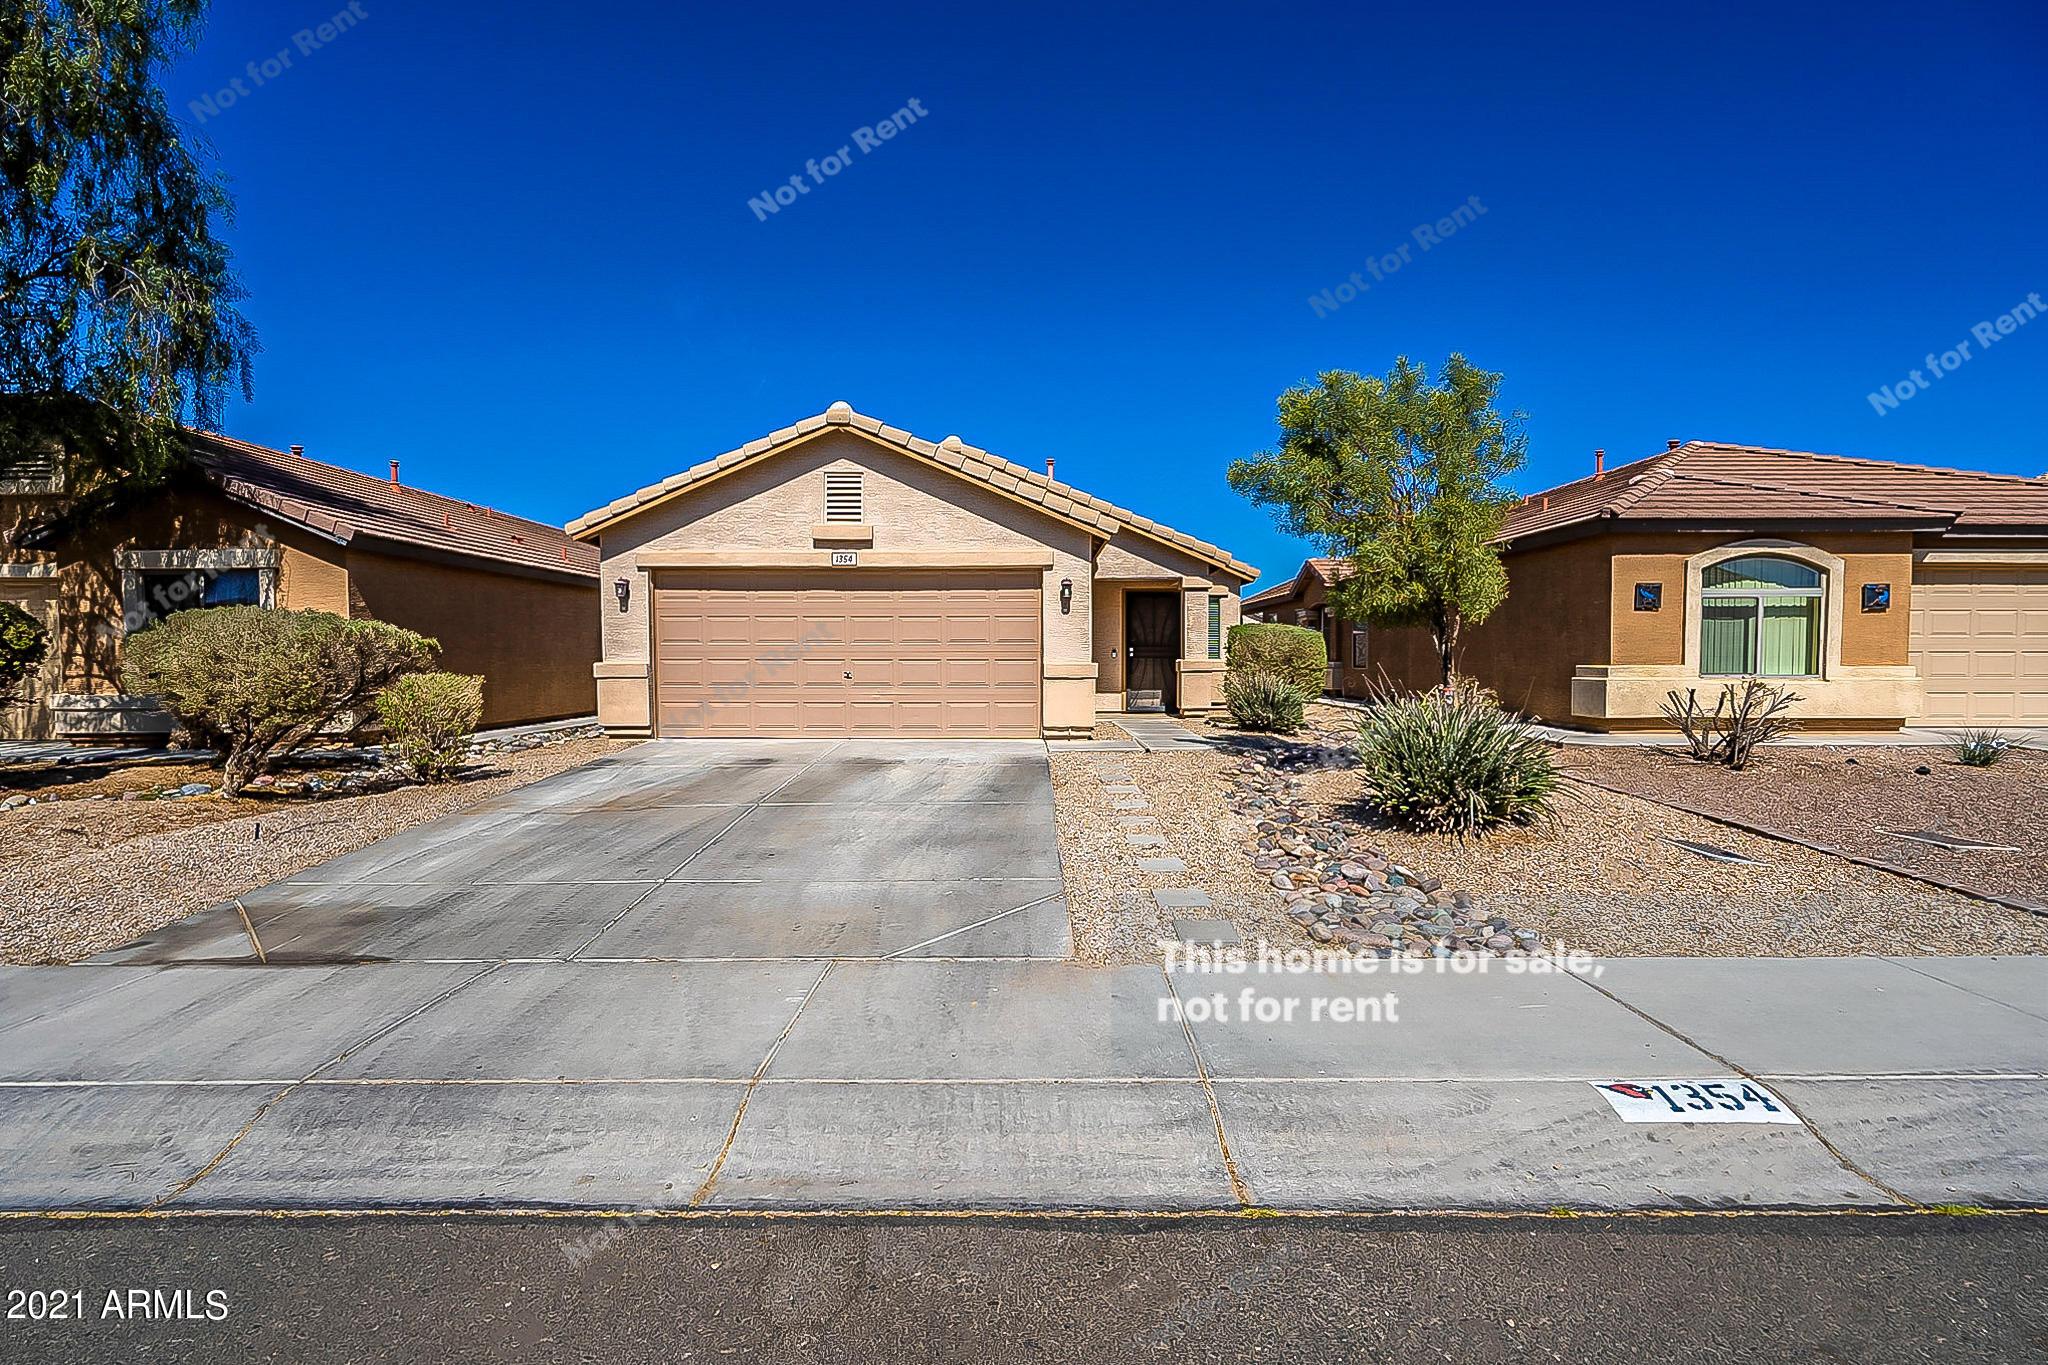 1354 E RYAN Road, San Tan Valley, AZ 85140, 3 Bedrooms Bedrooms, ,Residential,For Sale,1354 E RYAN Road,6203871